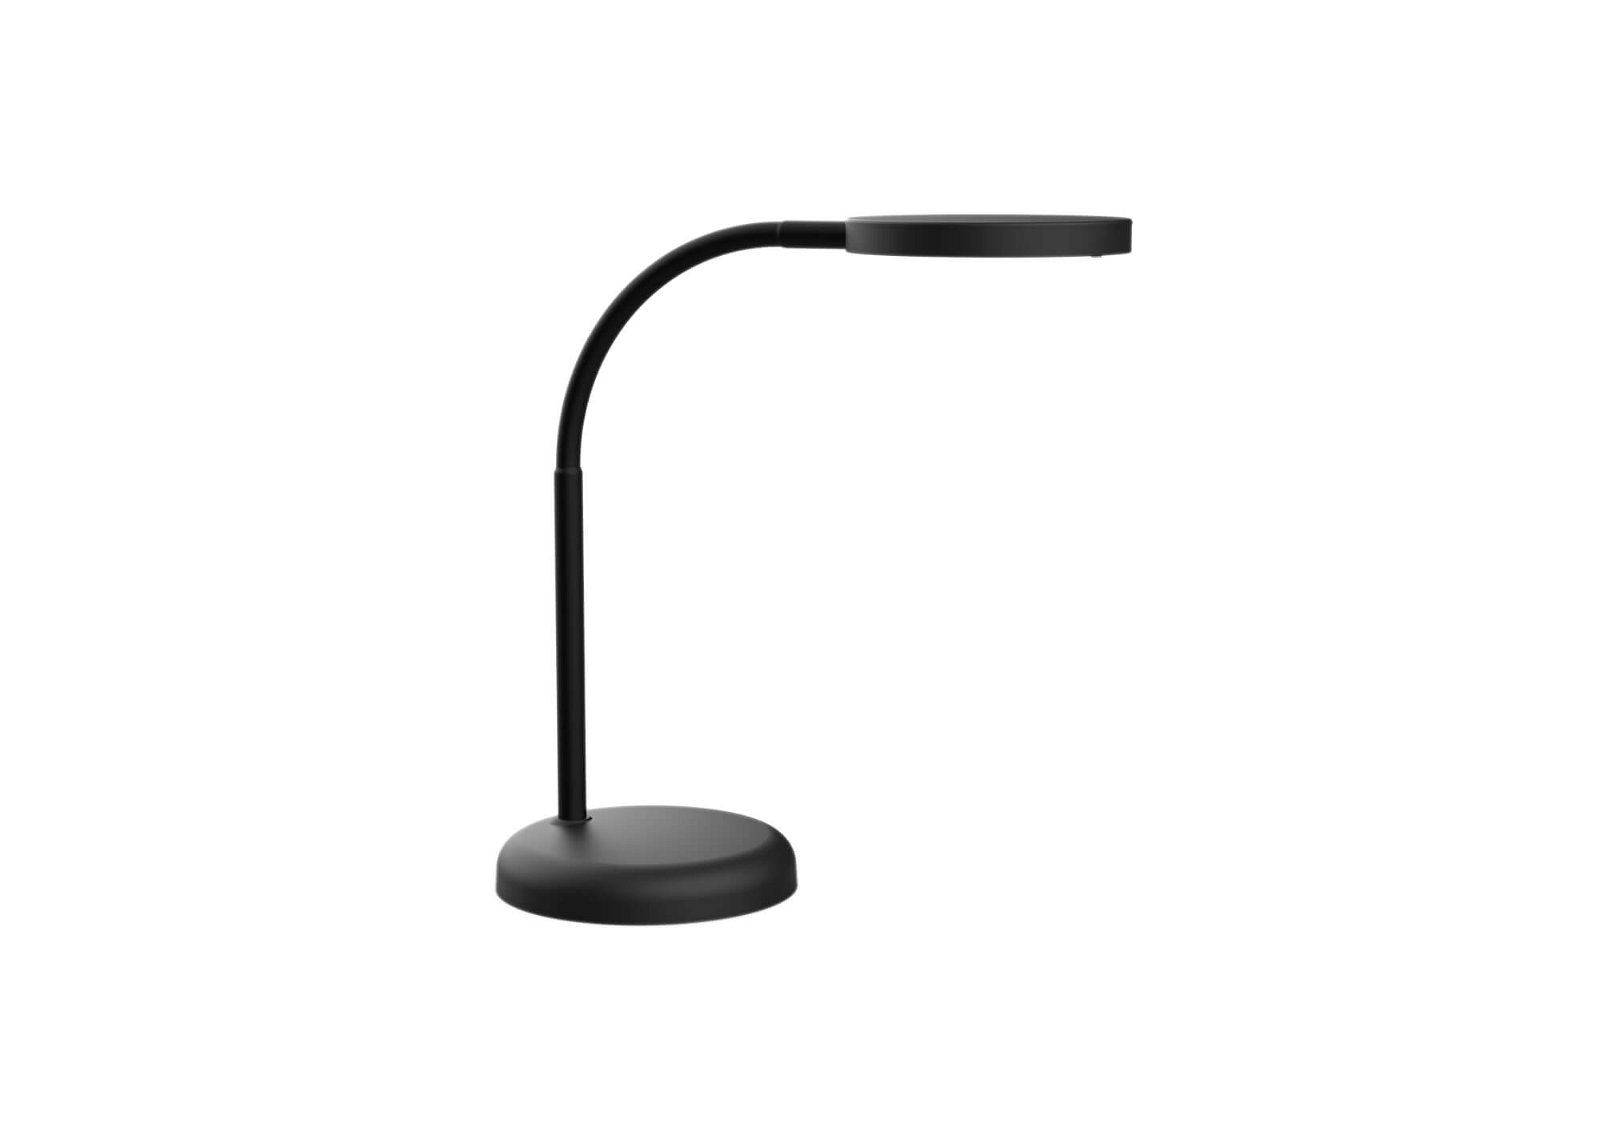 LED-Tischleuchte MAULjoy - schwarz